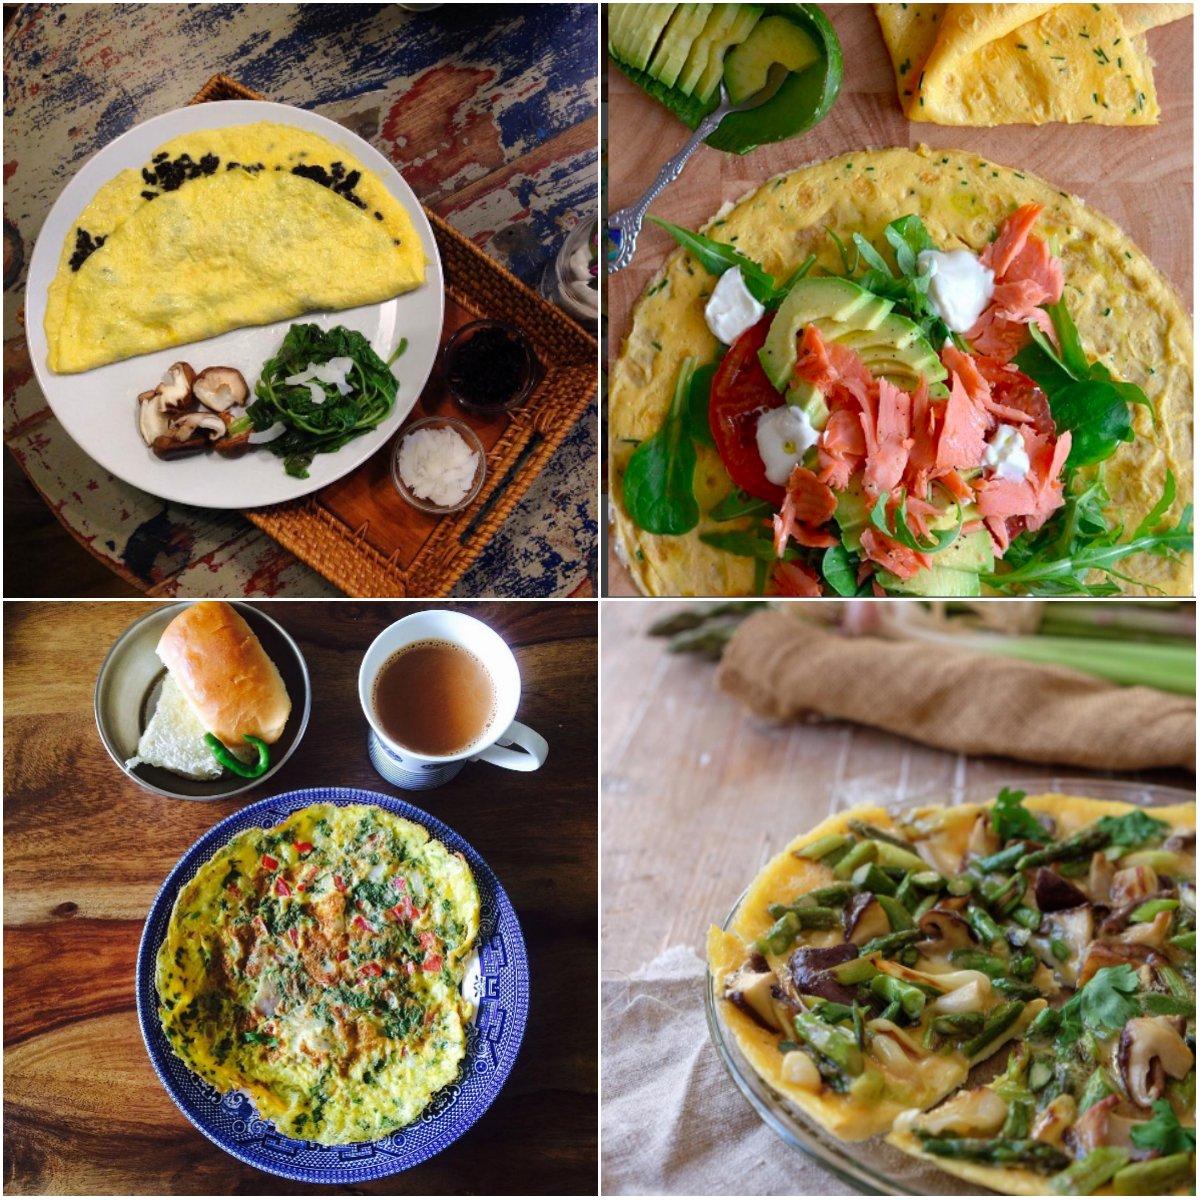 Get involved in the #FoodRevolution International Omelette Challenge! get cracking x https://t.co/mwof5rSJbt https://t.co/tdJBU5A0Lq